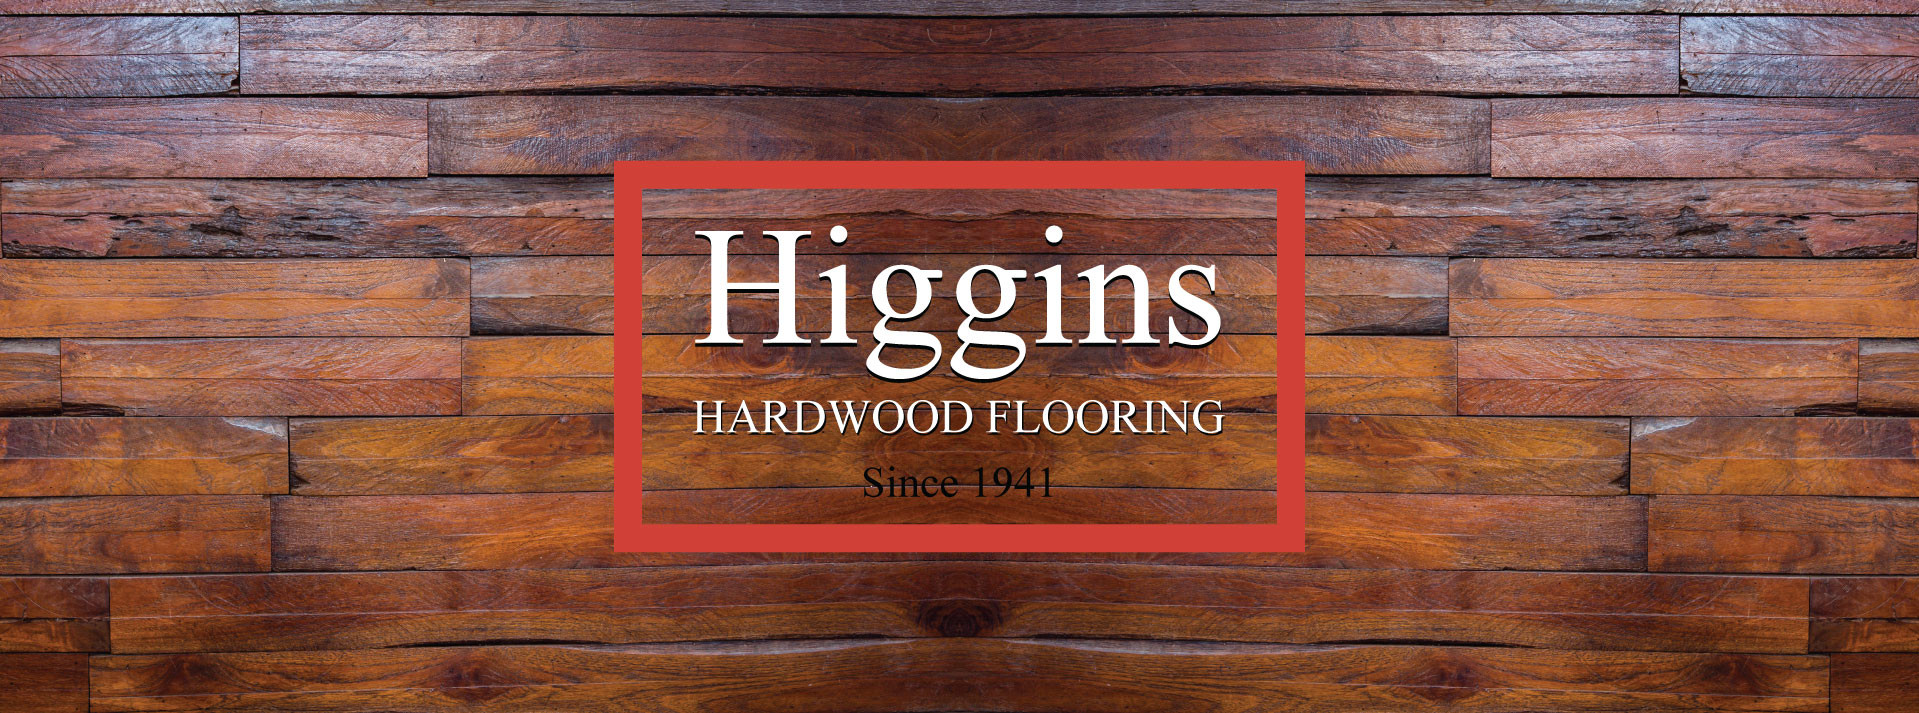 hardwood floor manufacturers ratings of higgins hardwood flooring in peterborough oshawa lindsay ajax with office hours